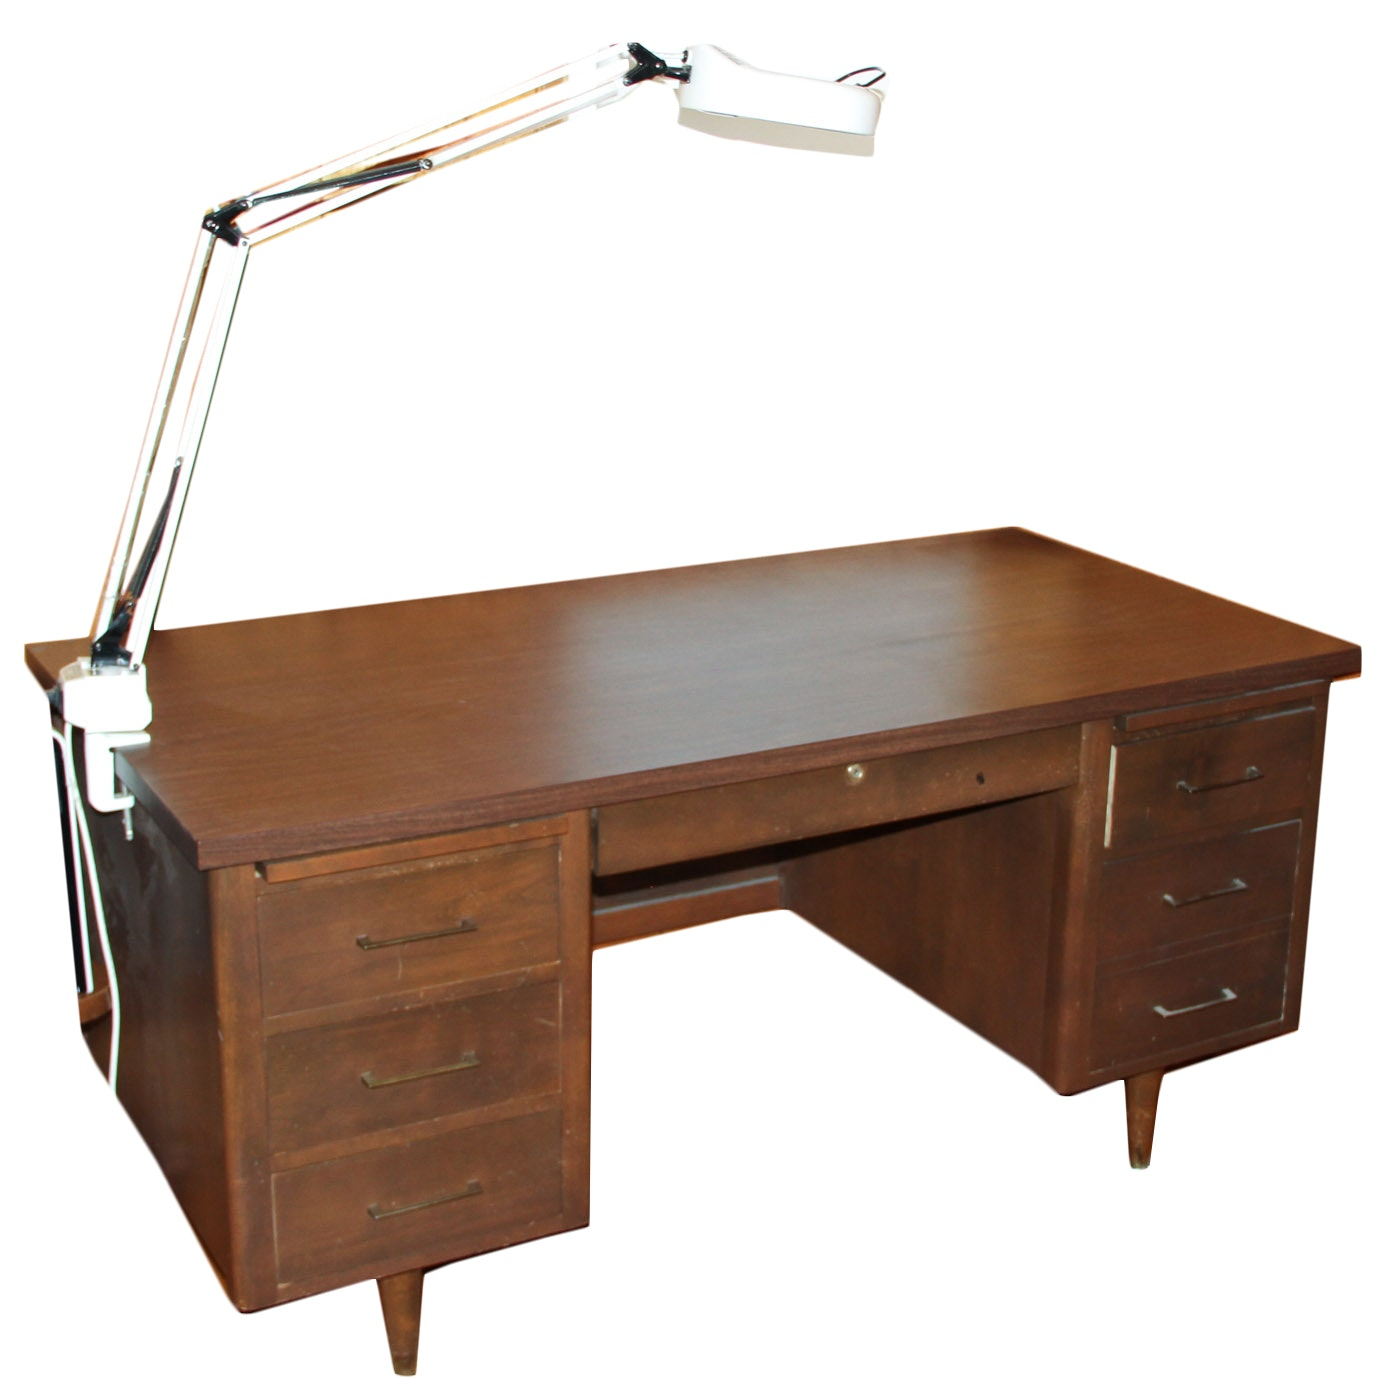 Vintage Work Desk with Attached Light